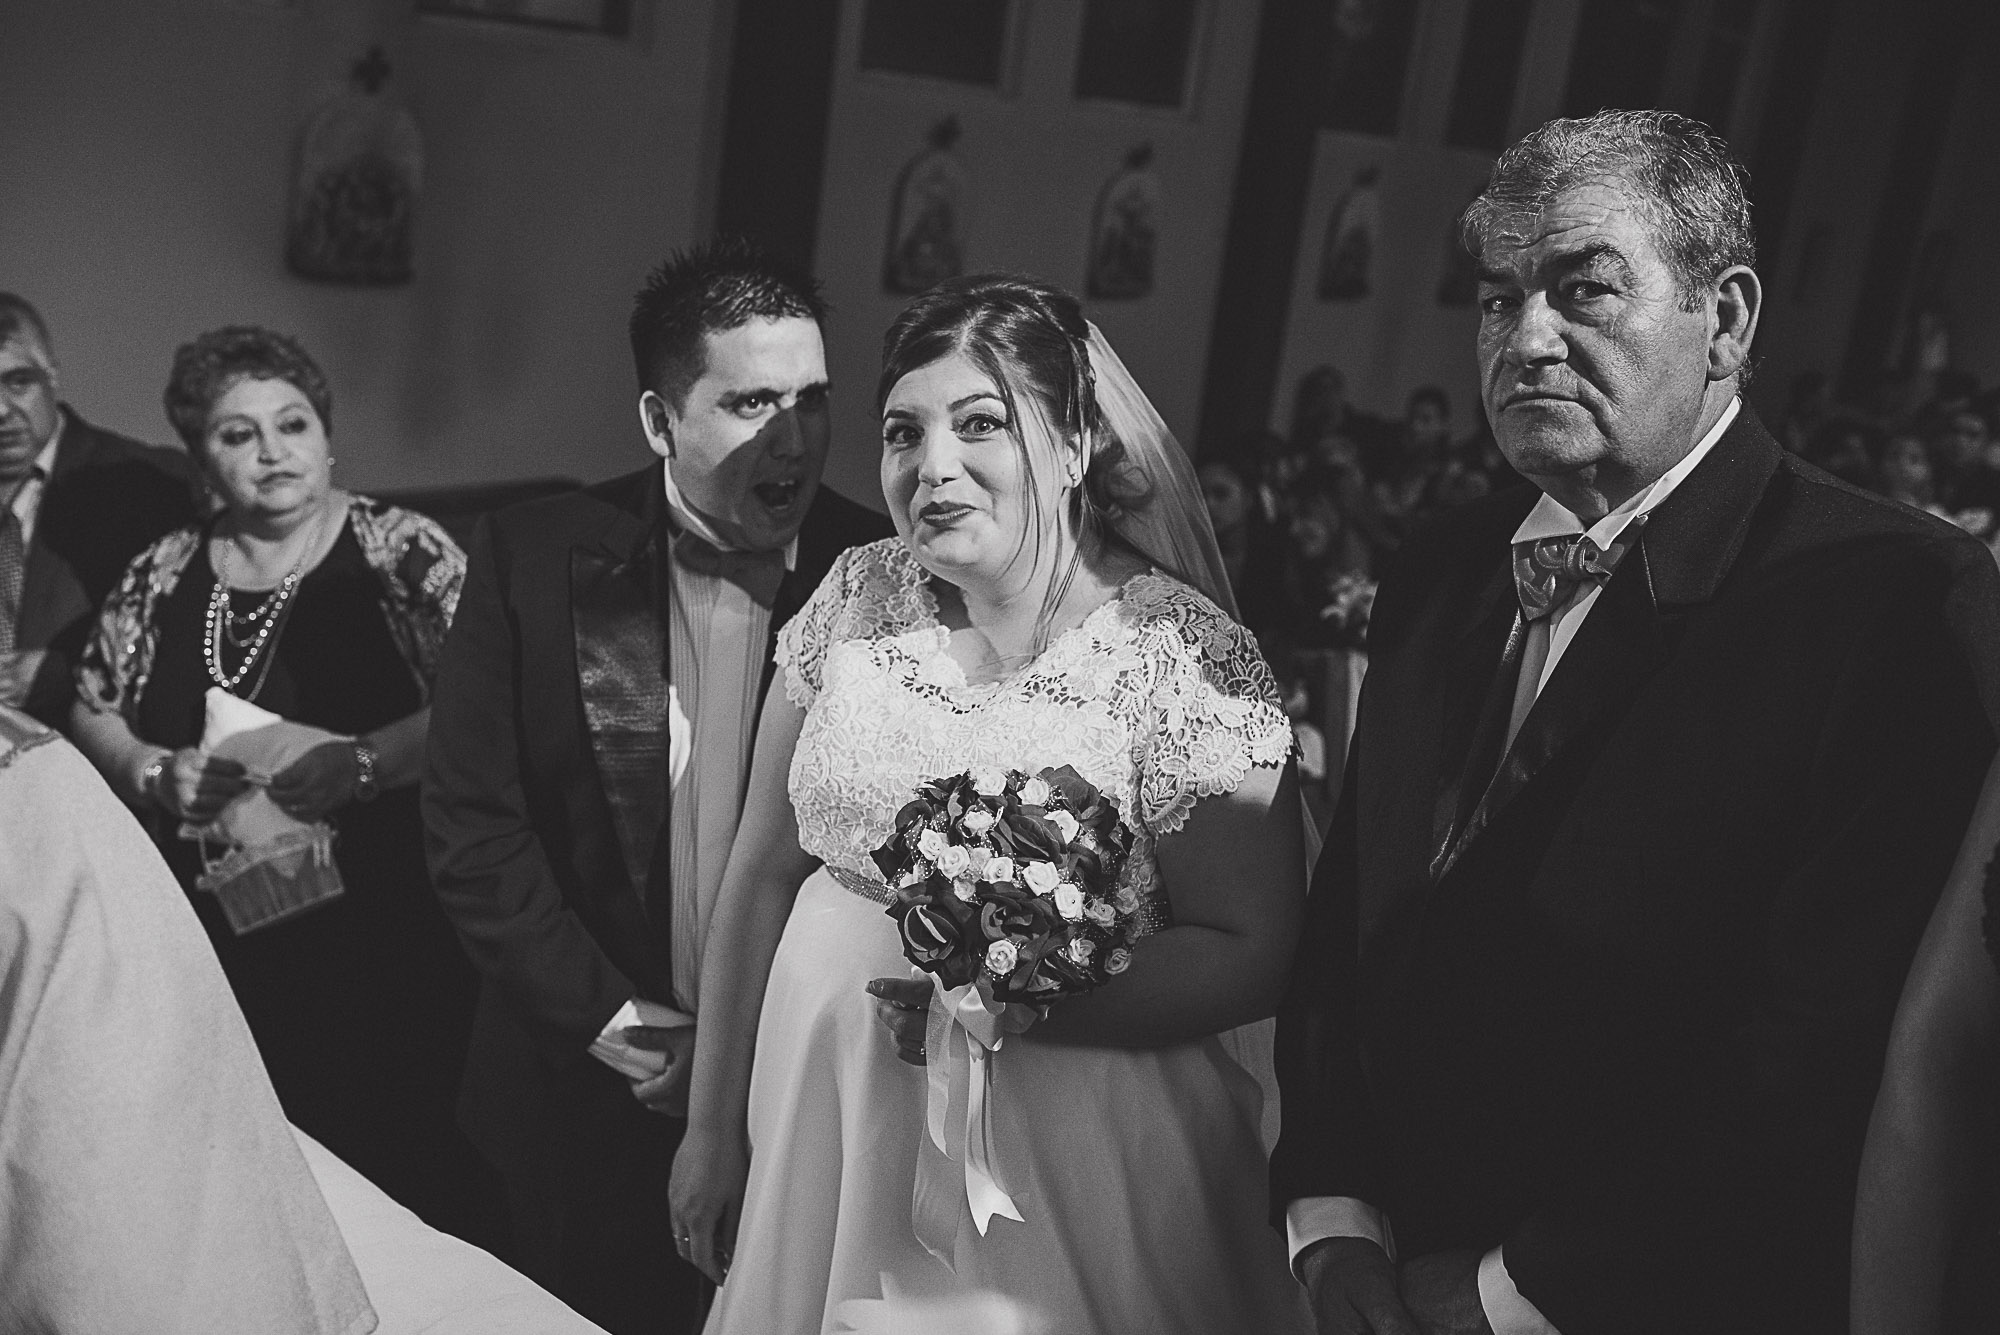 boda-vero-raul-patagonia-argentina-chilena-fotografo-de-bodas-argentina-casamiento-en-patagonia-gabriel-roa-photography-15